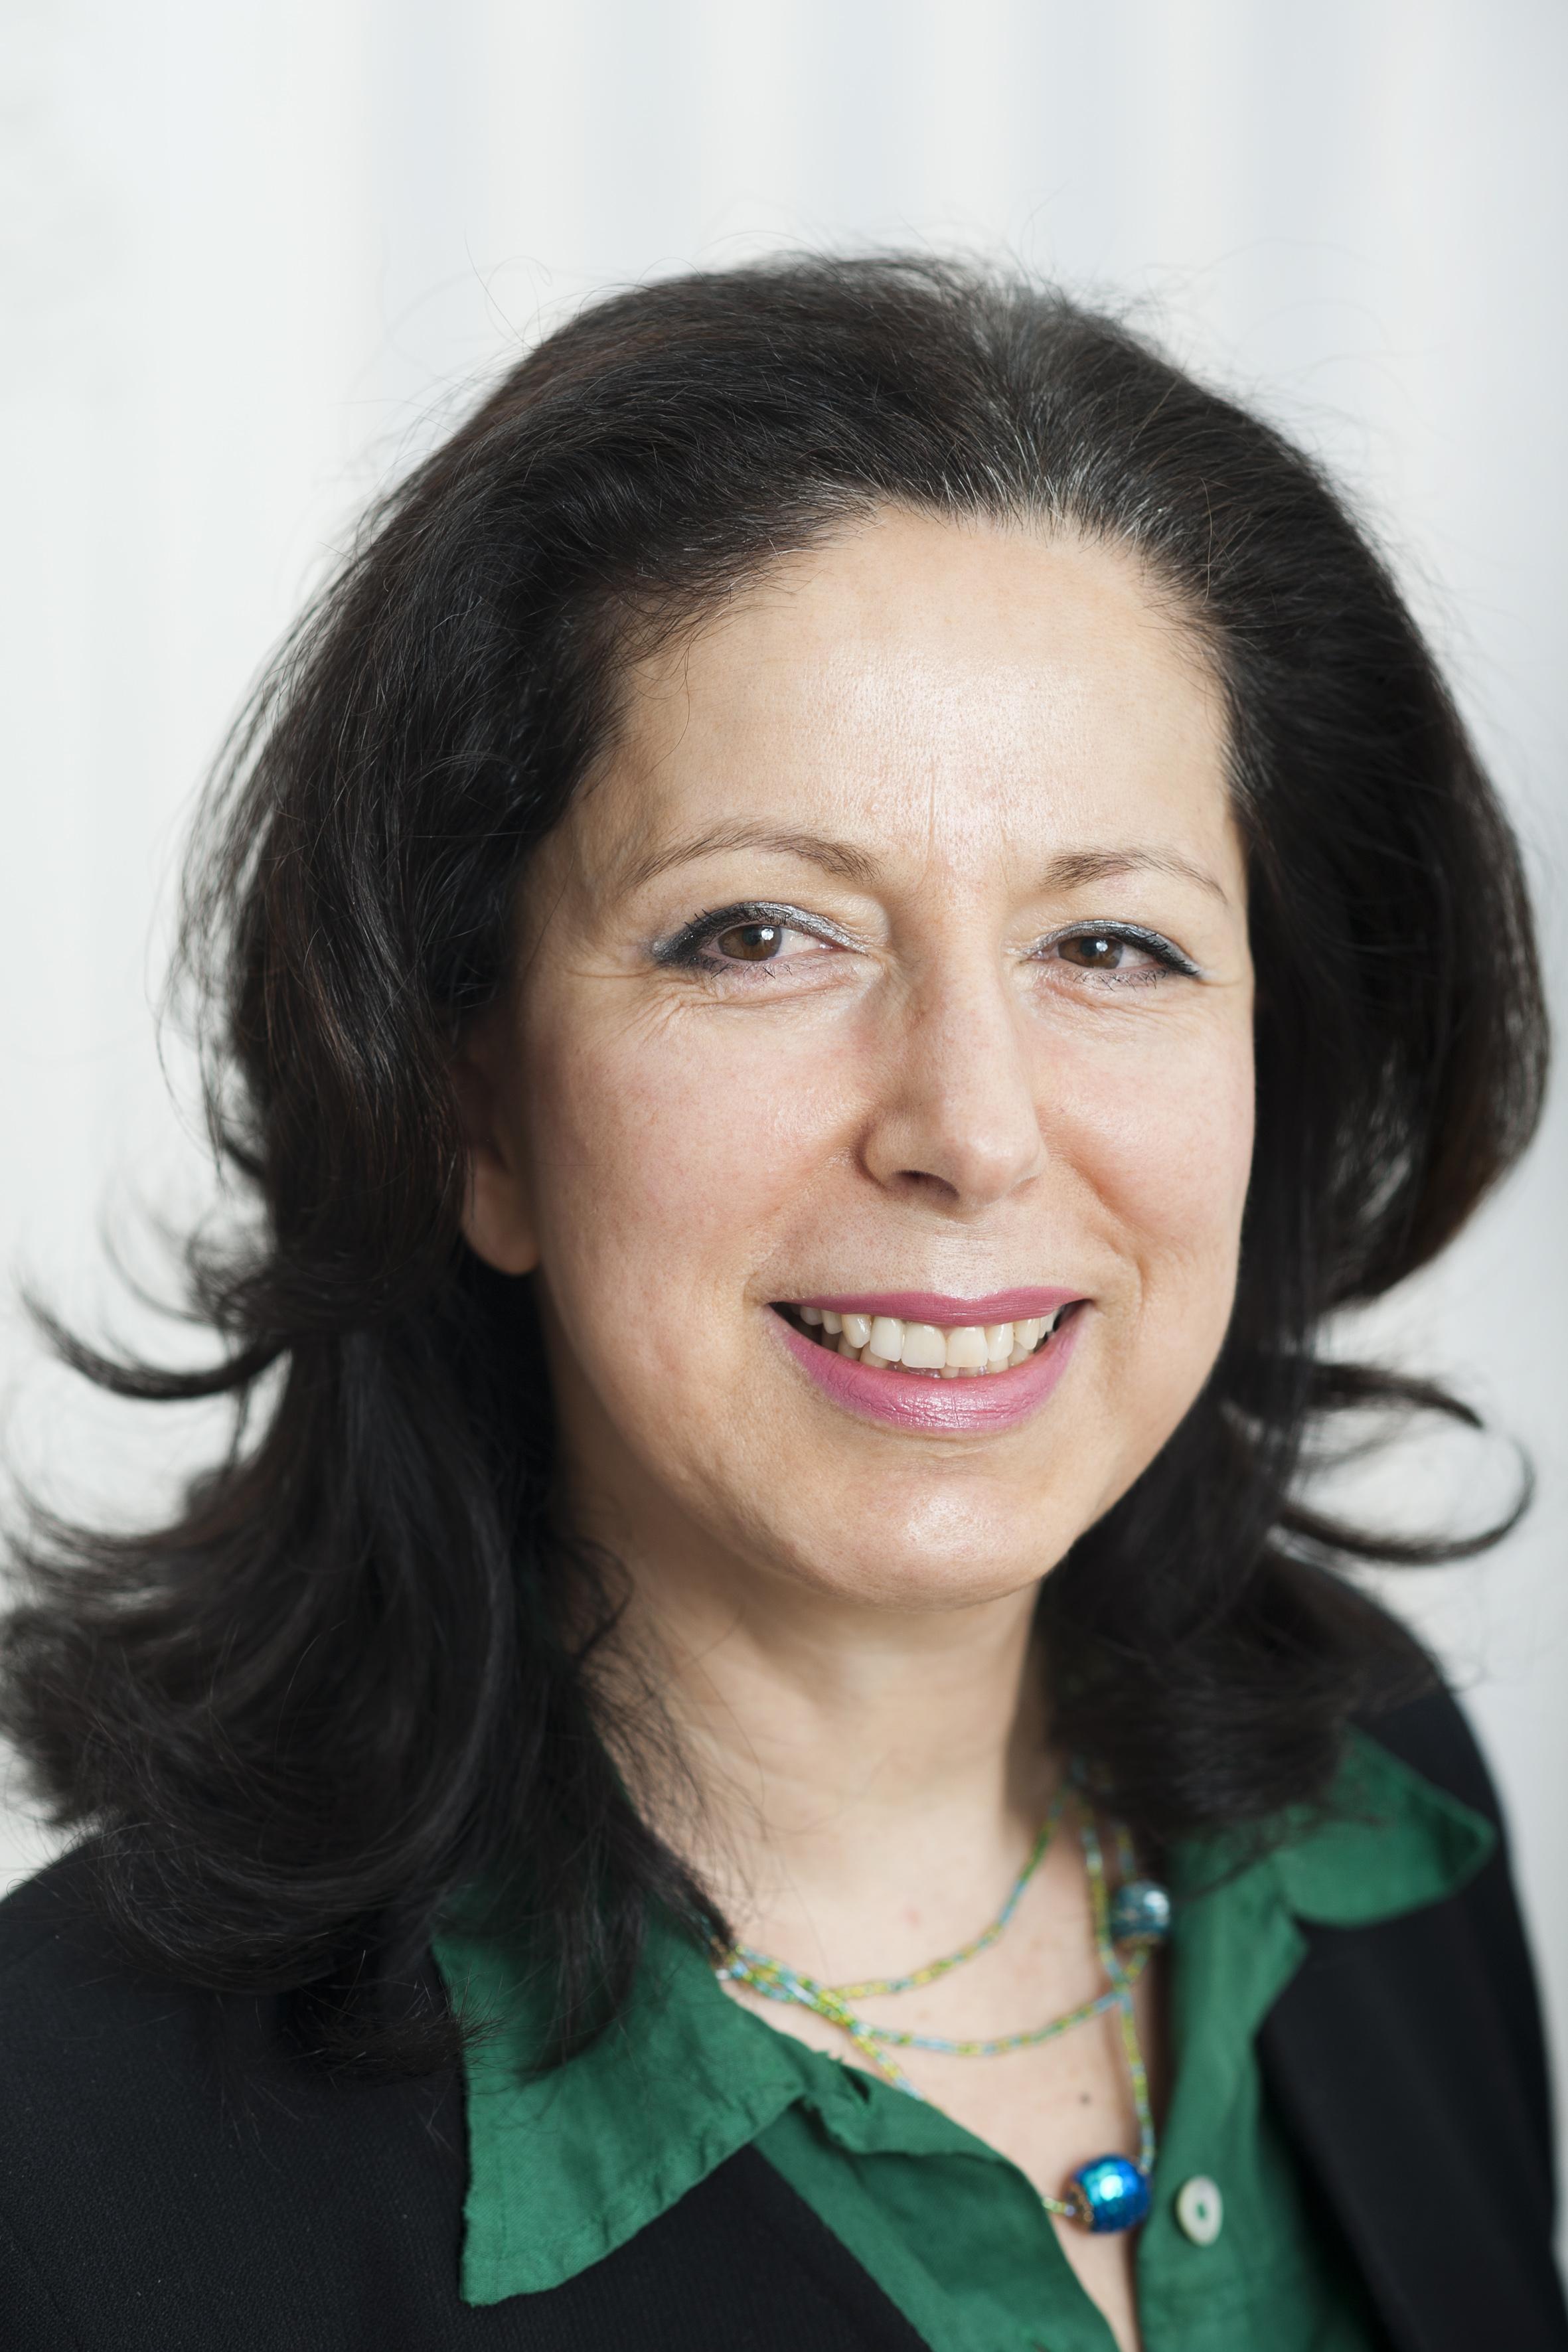 Christine Strauß